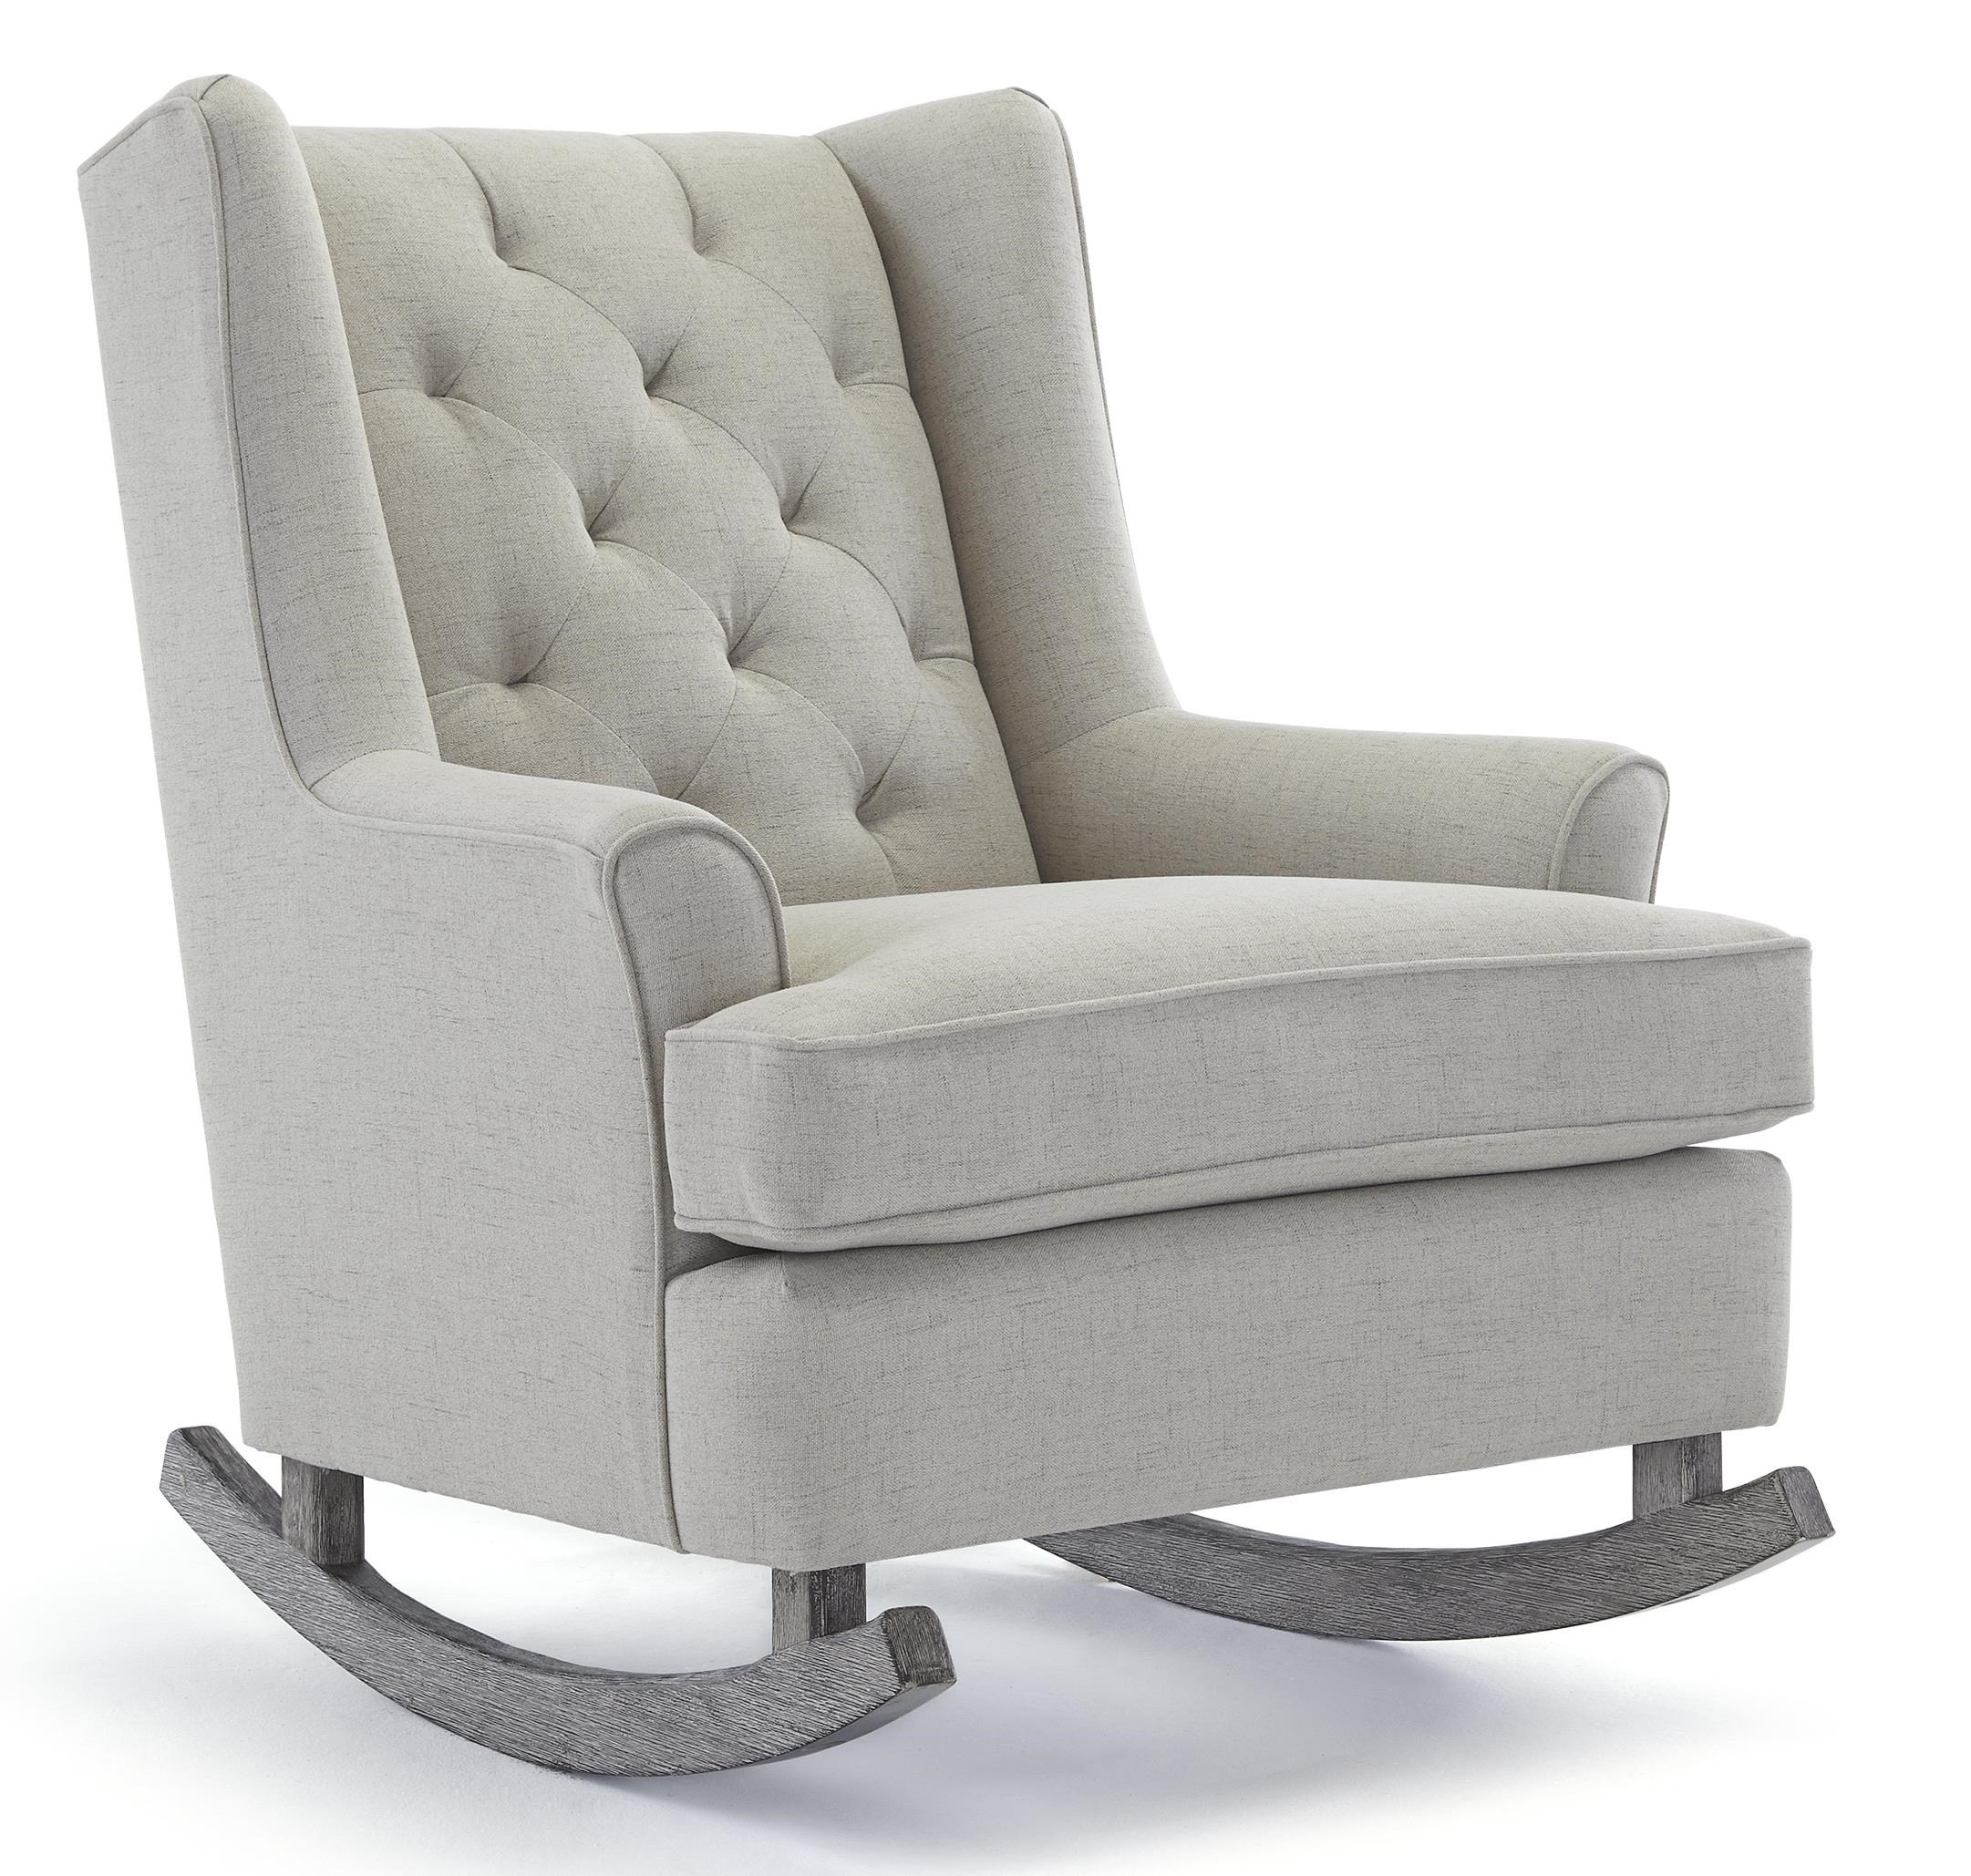 Charmant Best Home Furnishings Runner RockersPaisley Rocking Chair